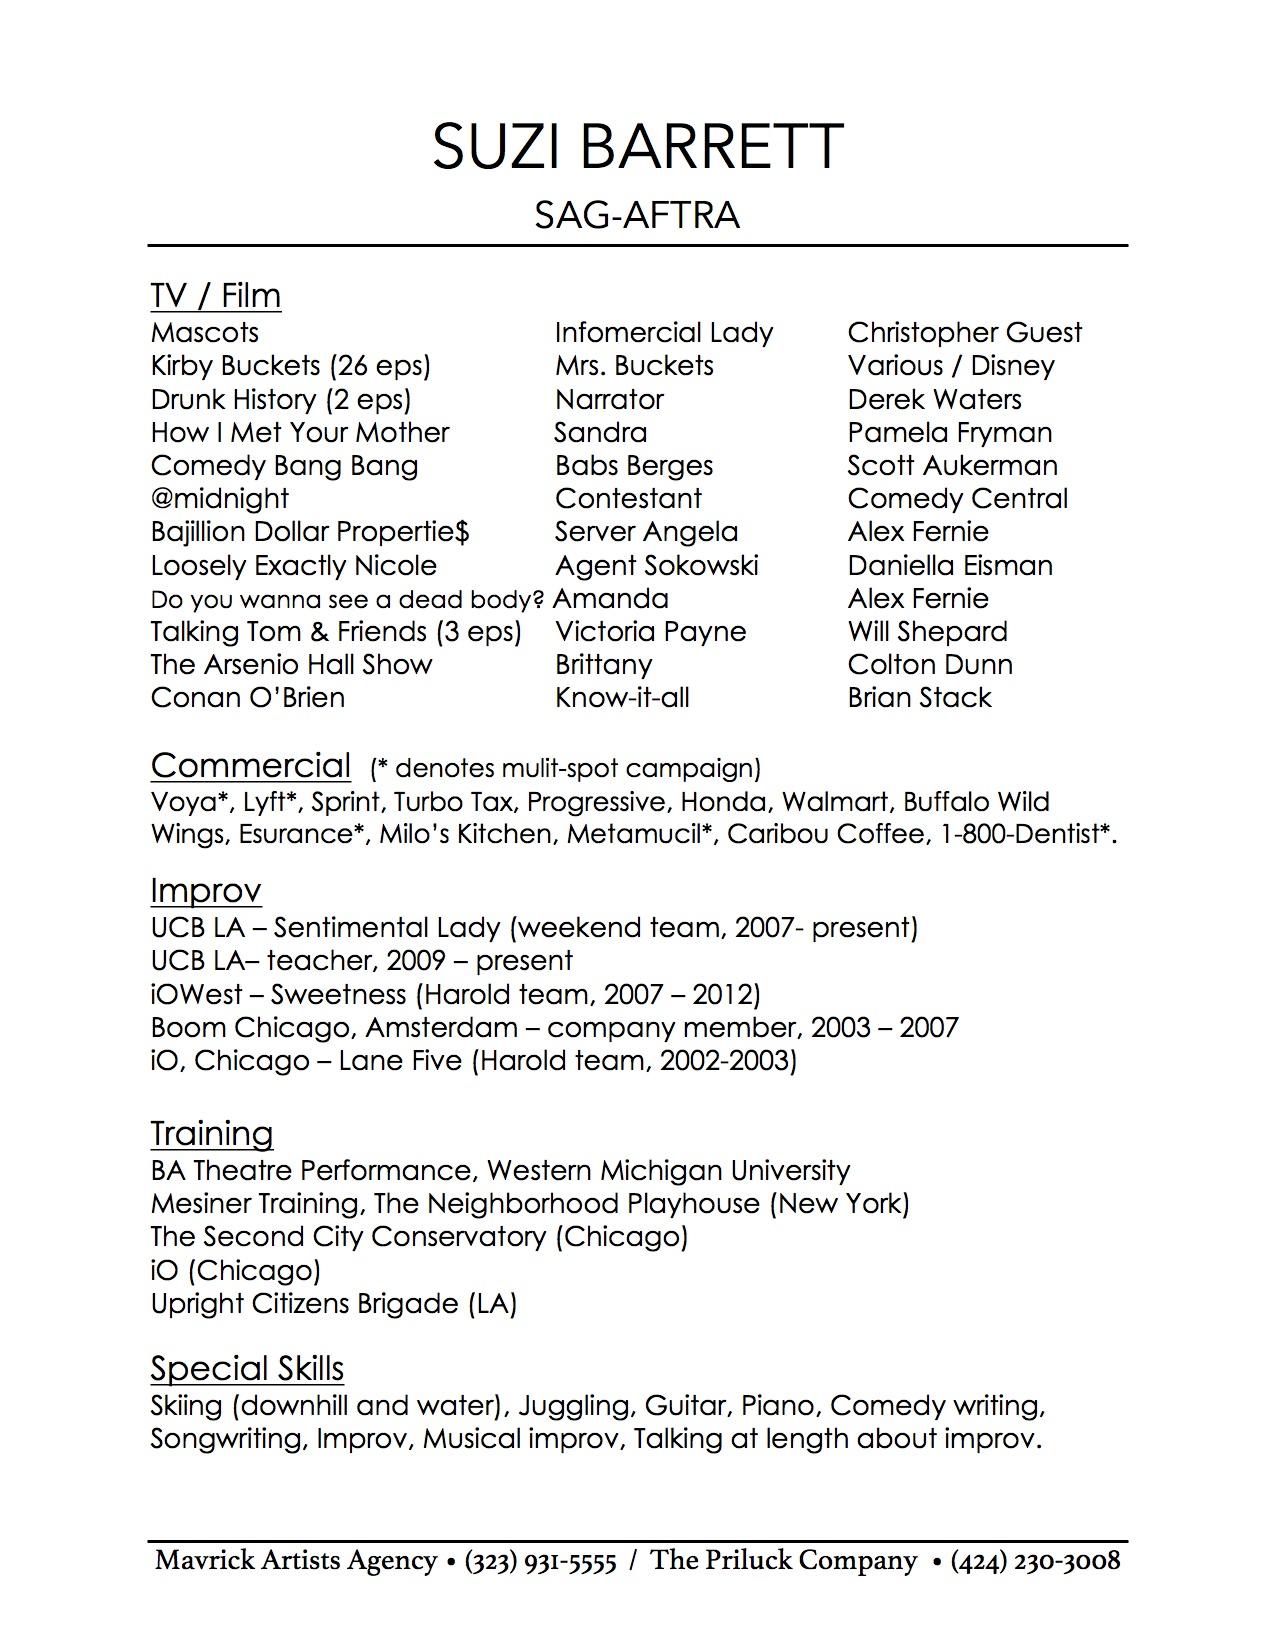 Theatrical Resume.jpg